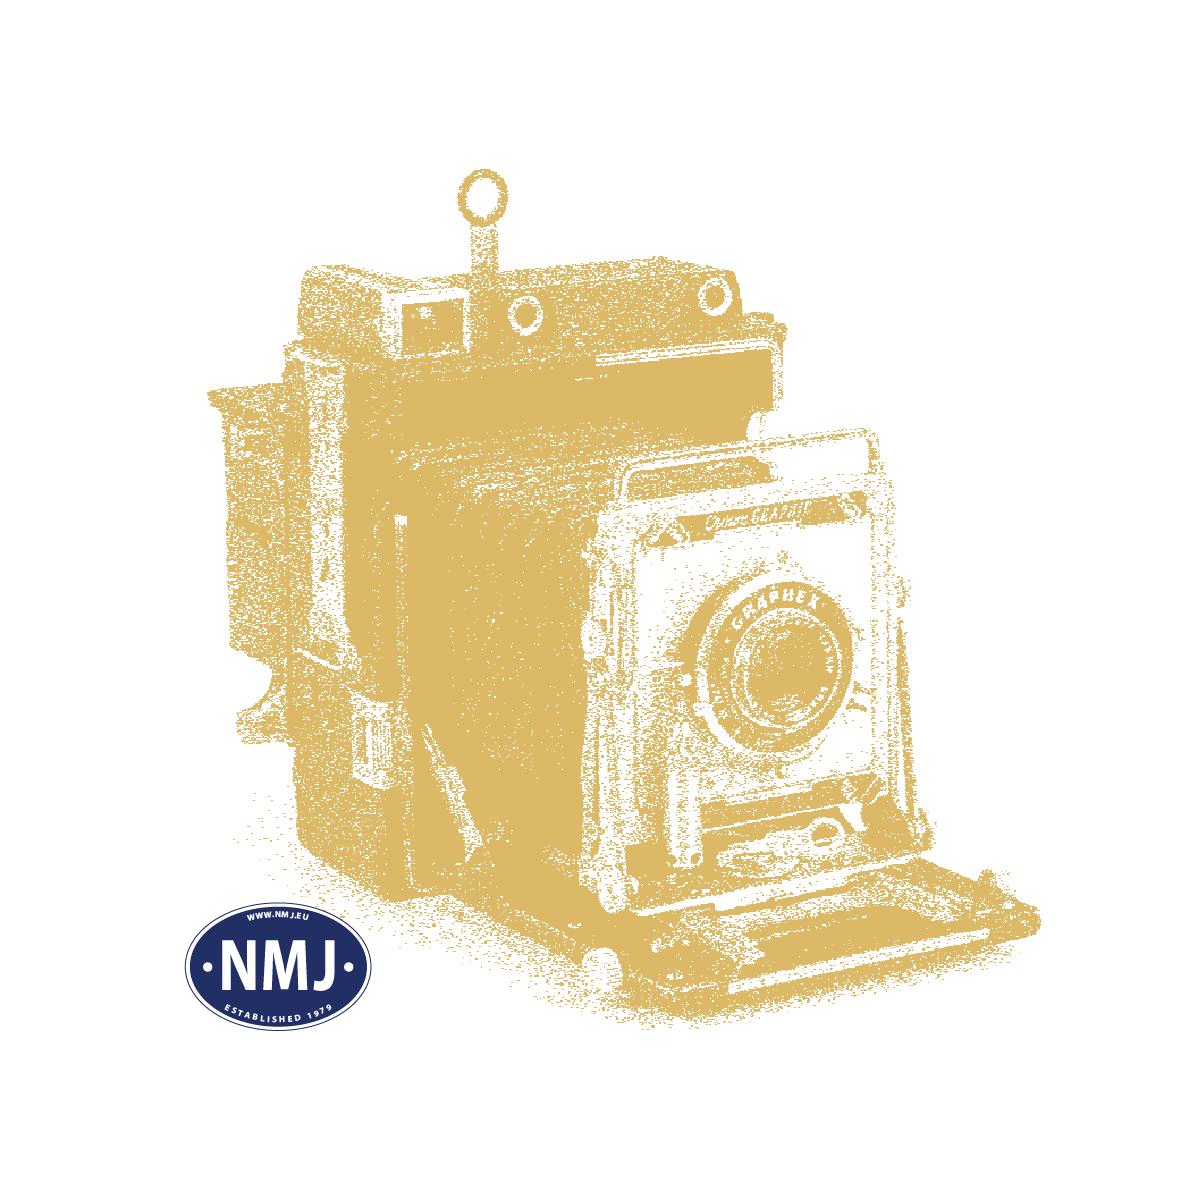 NMJT504.501 - NMJ Topline NSB His 210 2 773-9, type 5